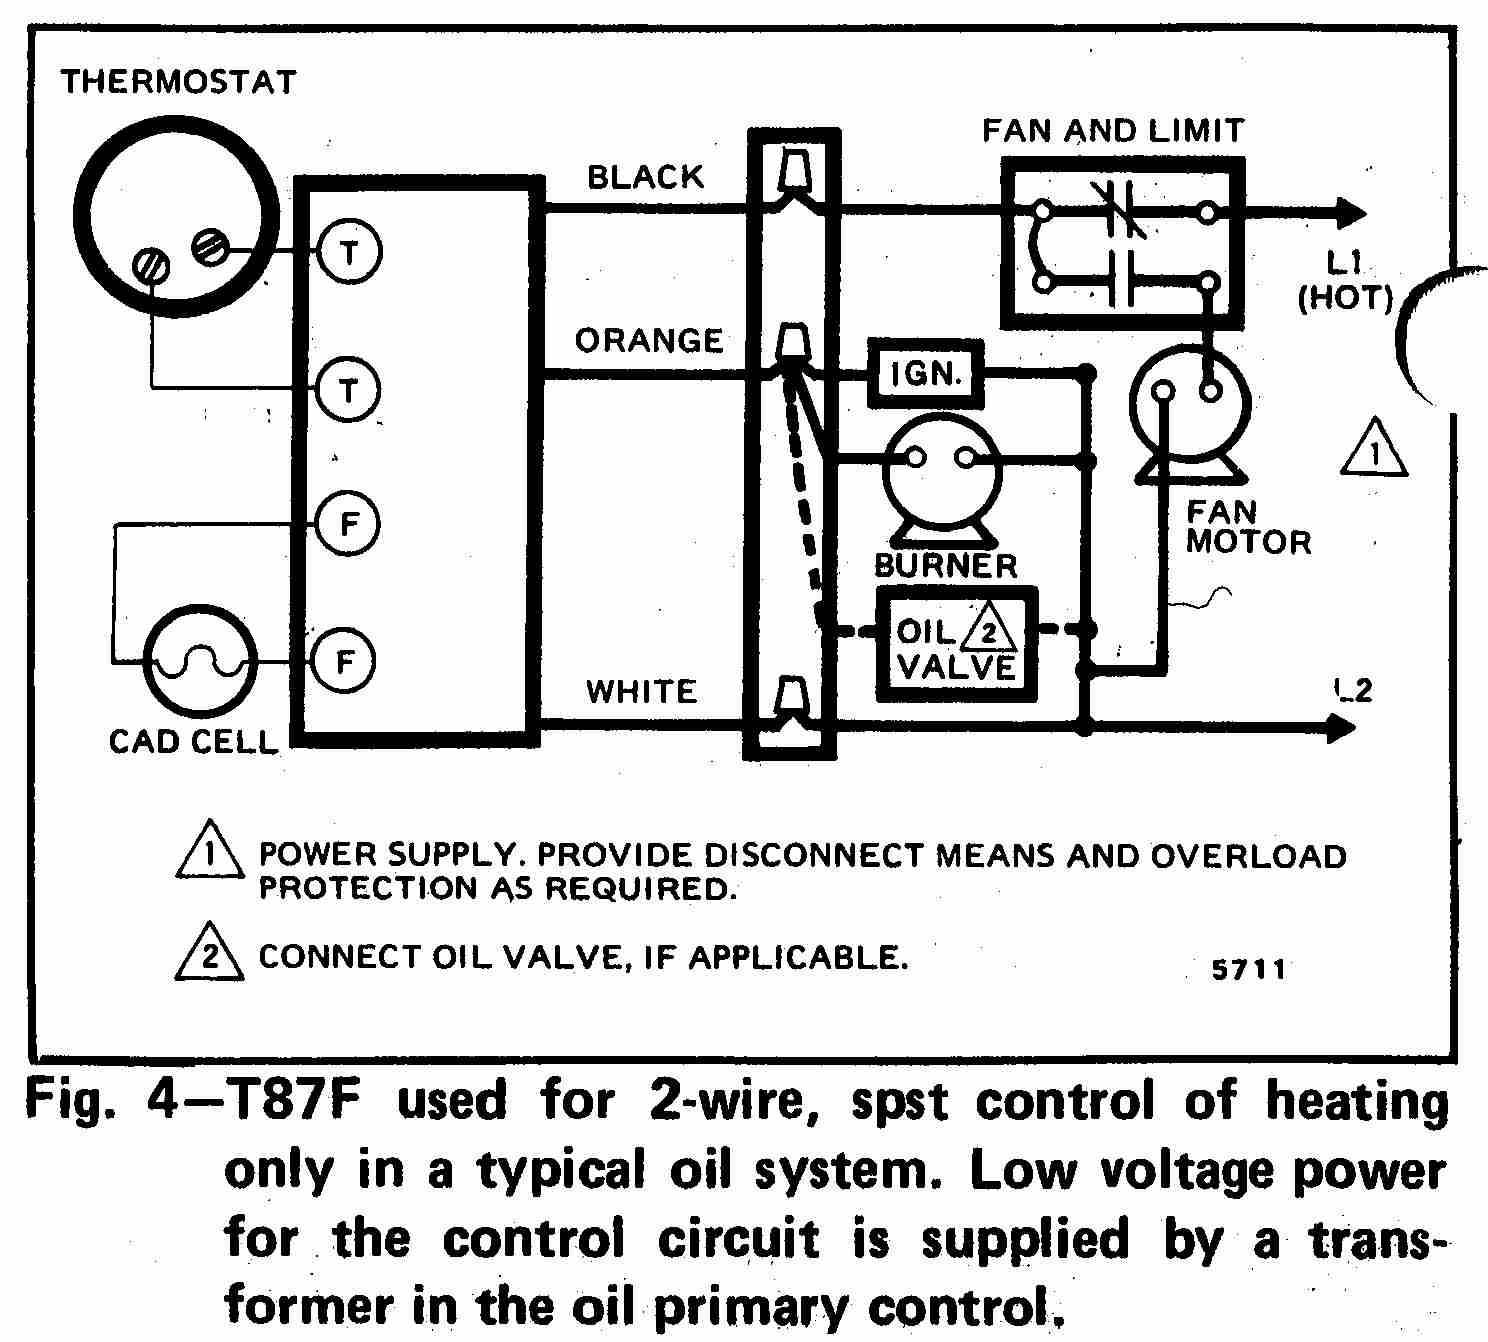 Awesome Hvac Low Voltage Wiring Wiring Diagram Wiring Cloud Waroletkolfr09Org